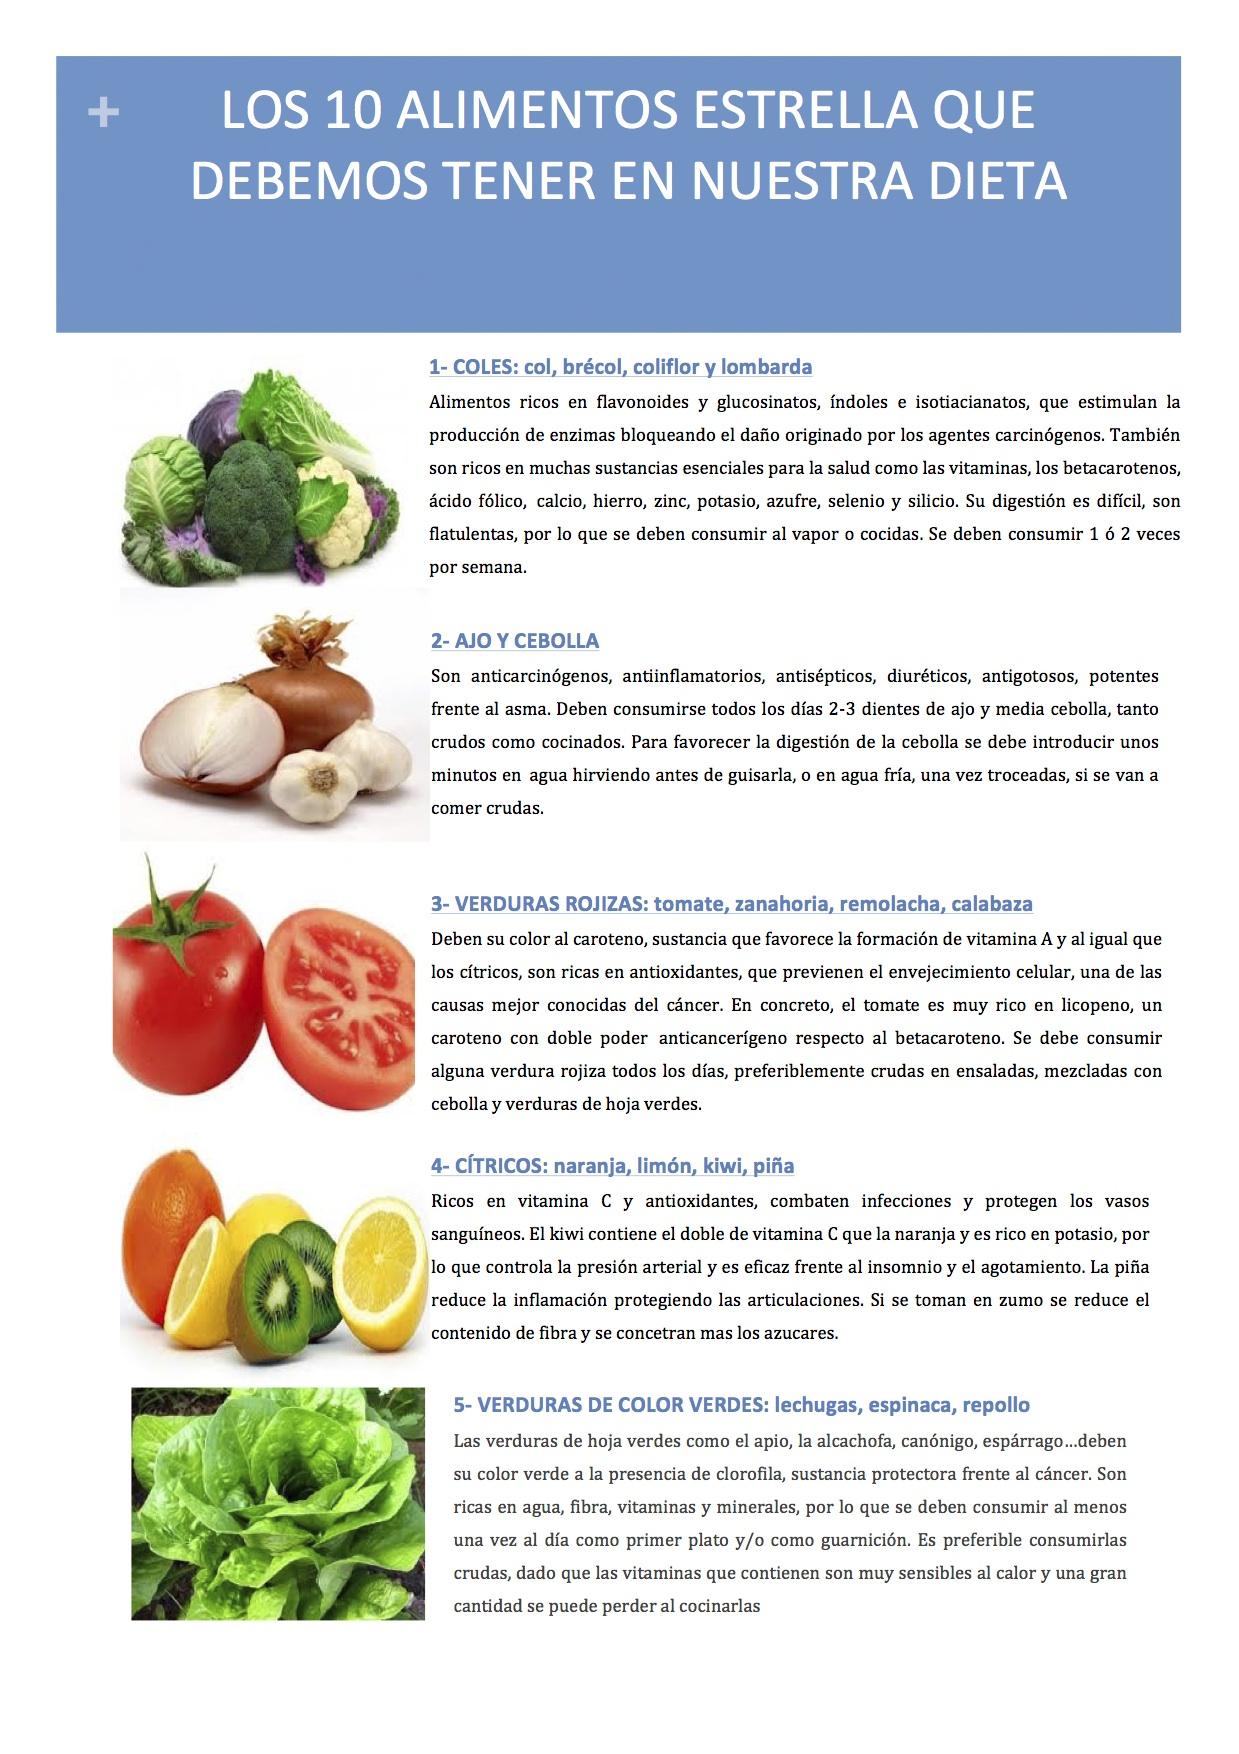 4 consejos para mantener una dieta equilibrada